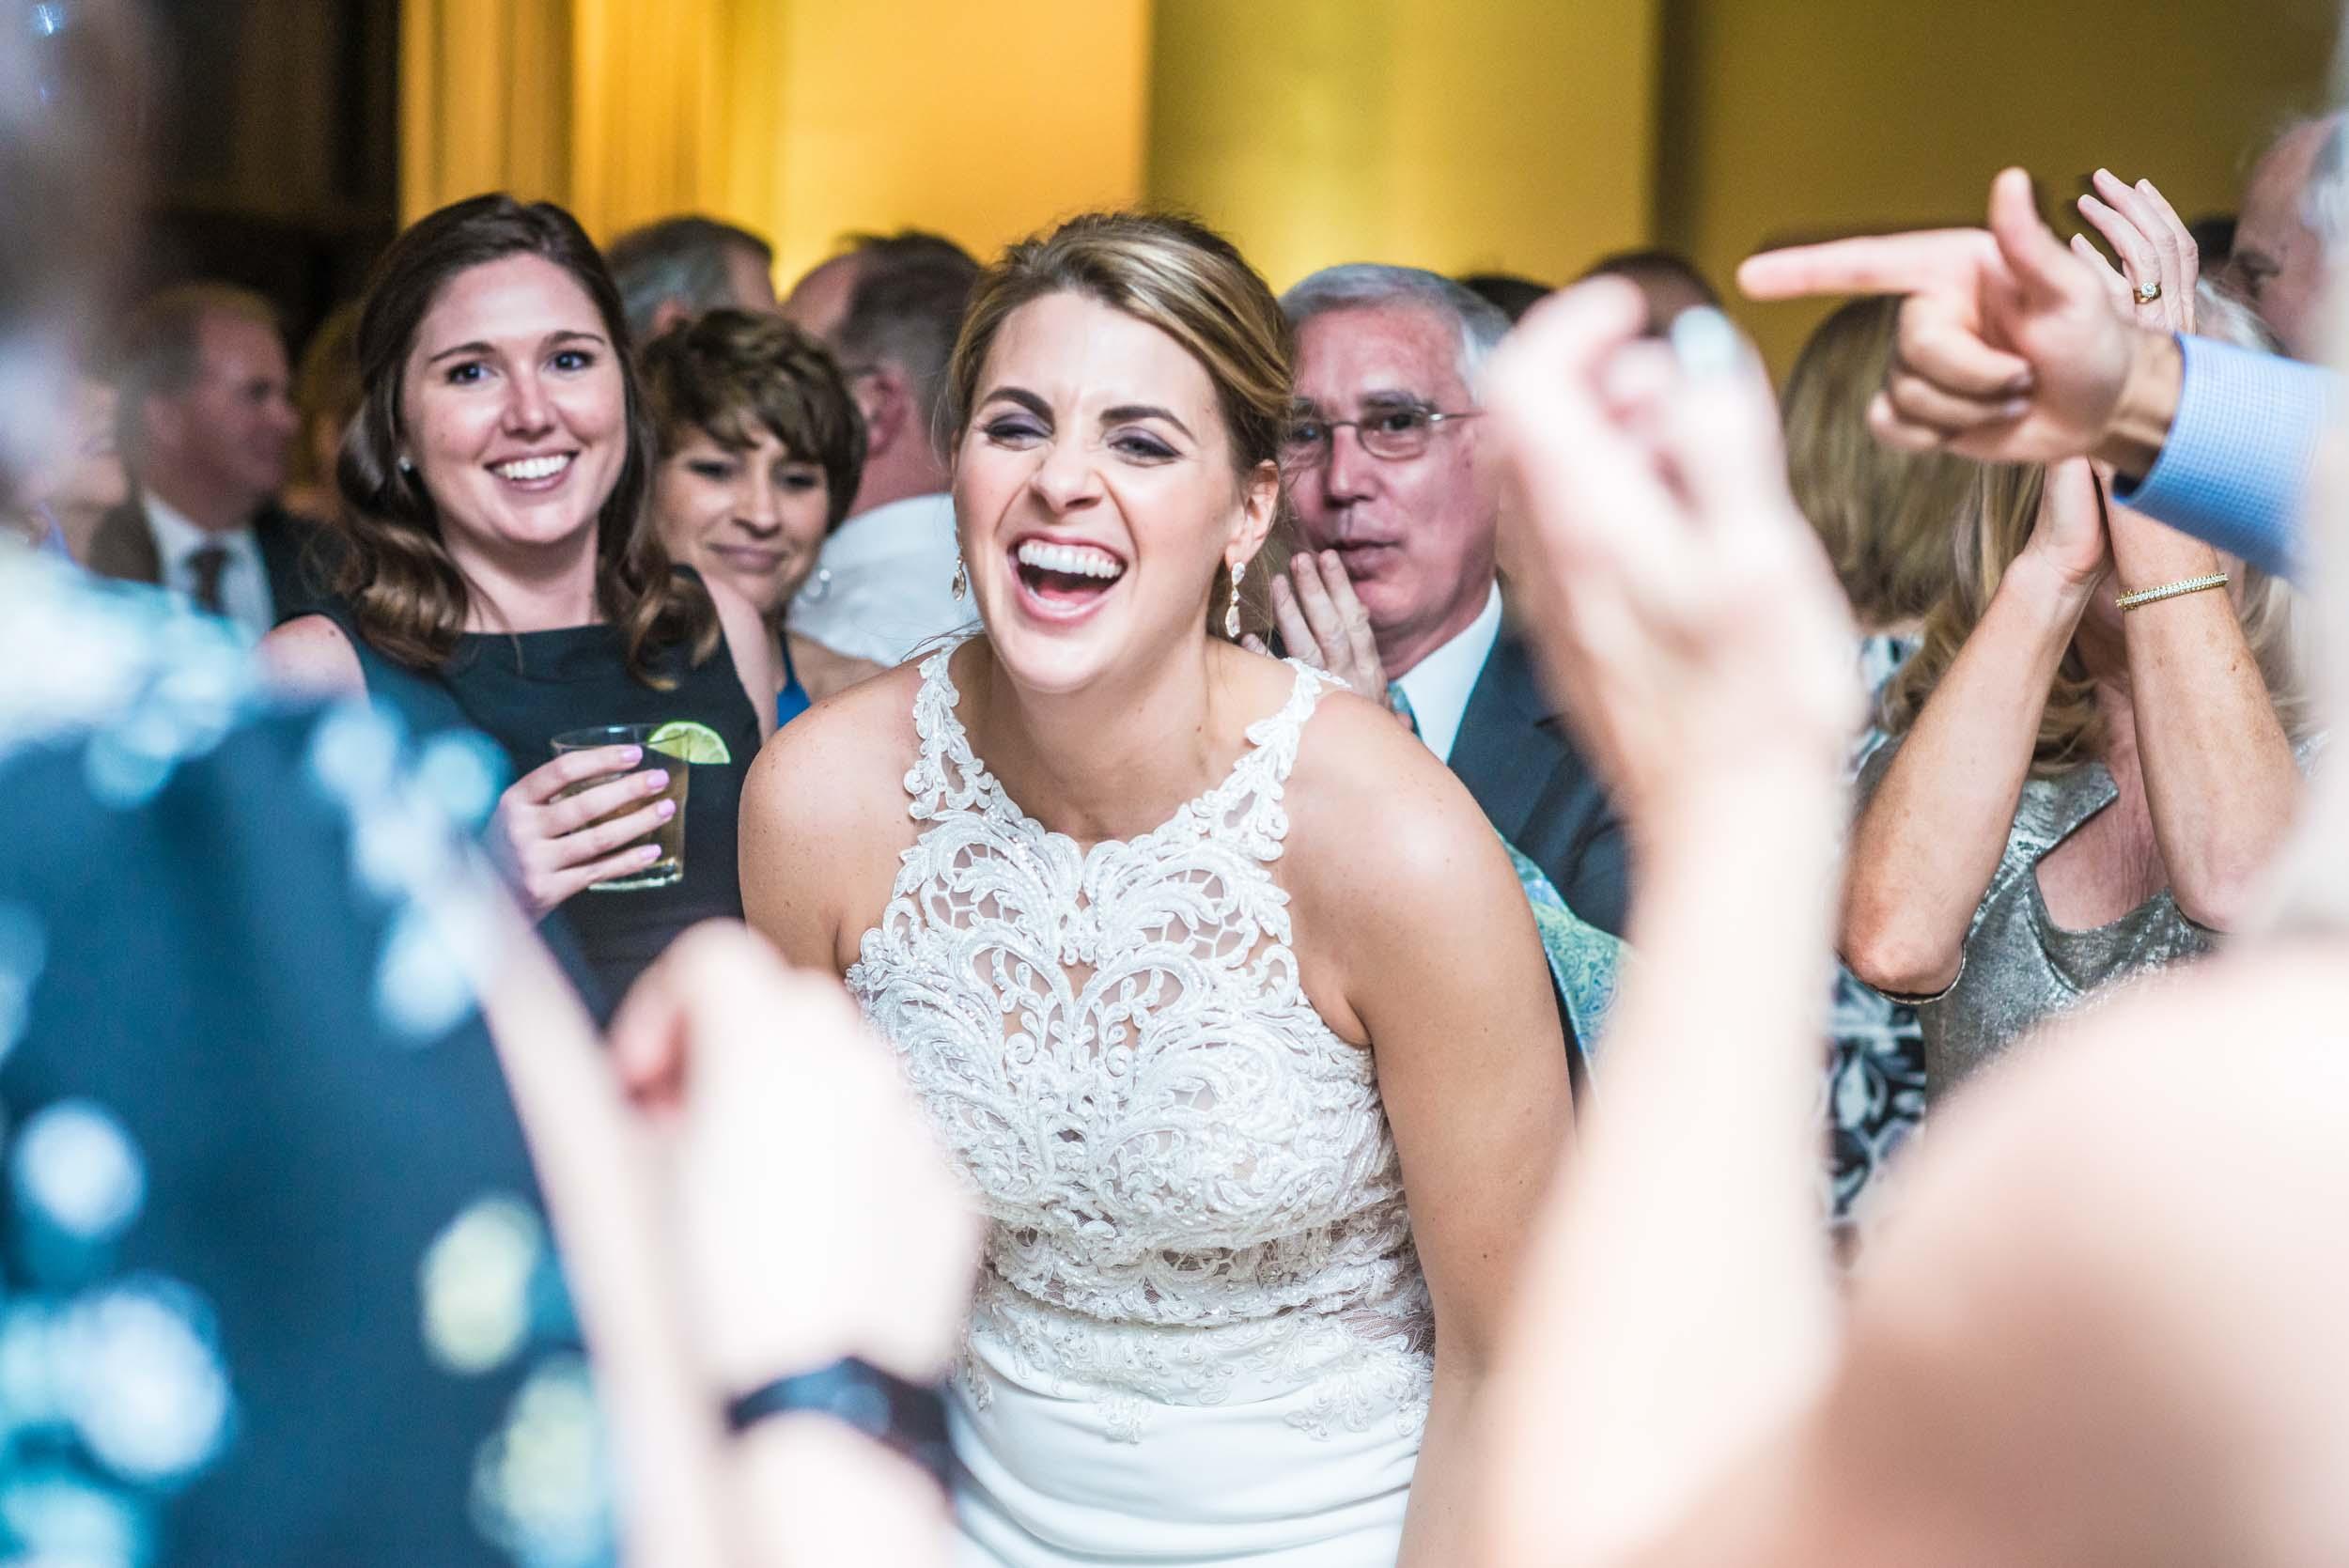 dc+metro+wedding+photographer+vadym+guliuk+photography+wedding+reception-2034.jpg